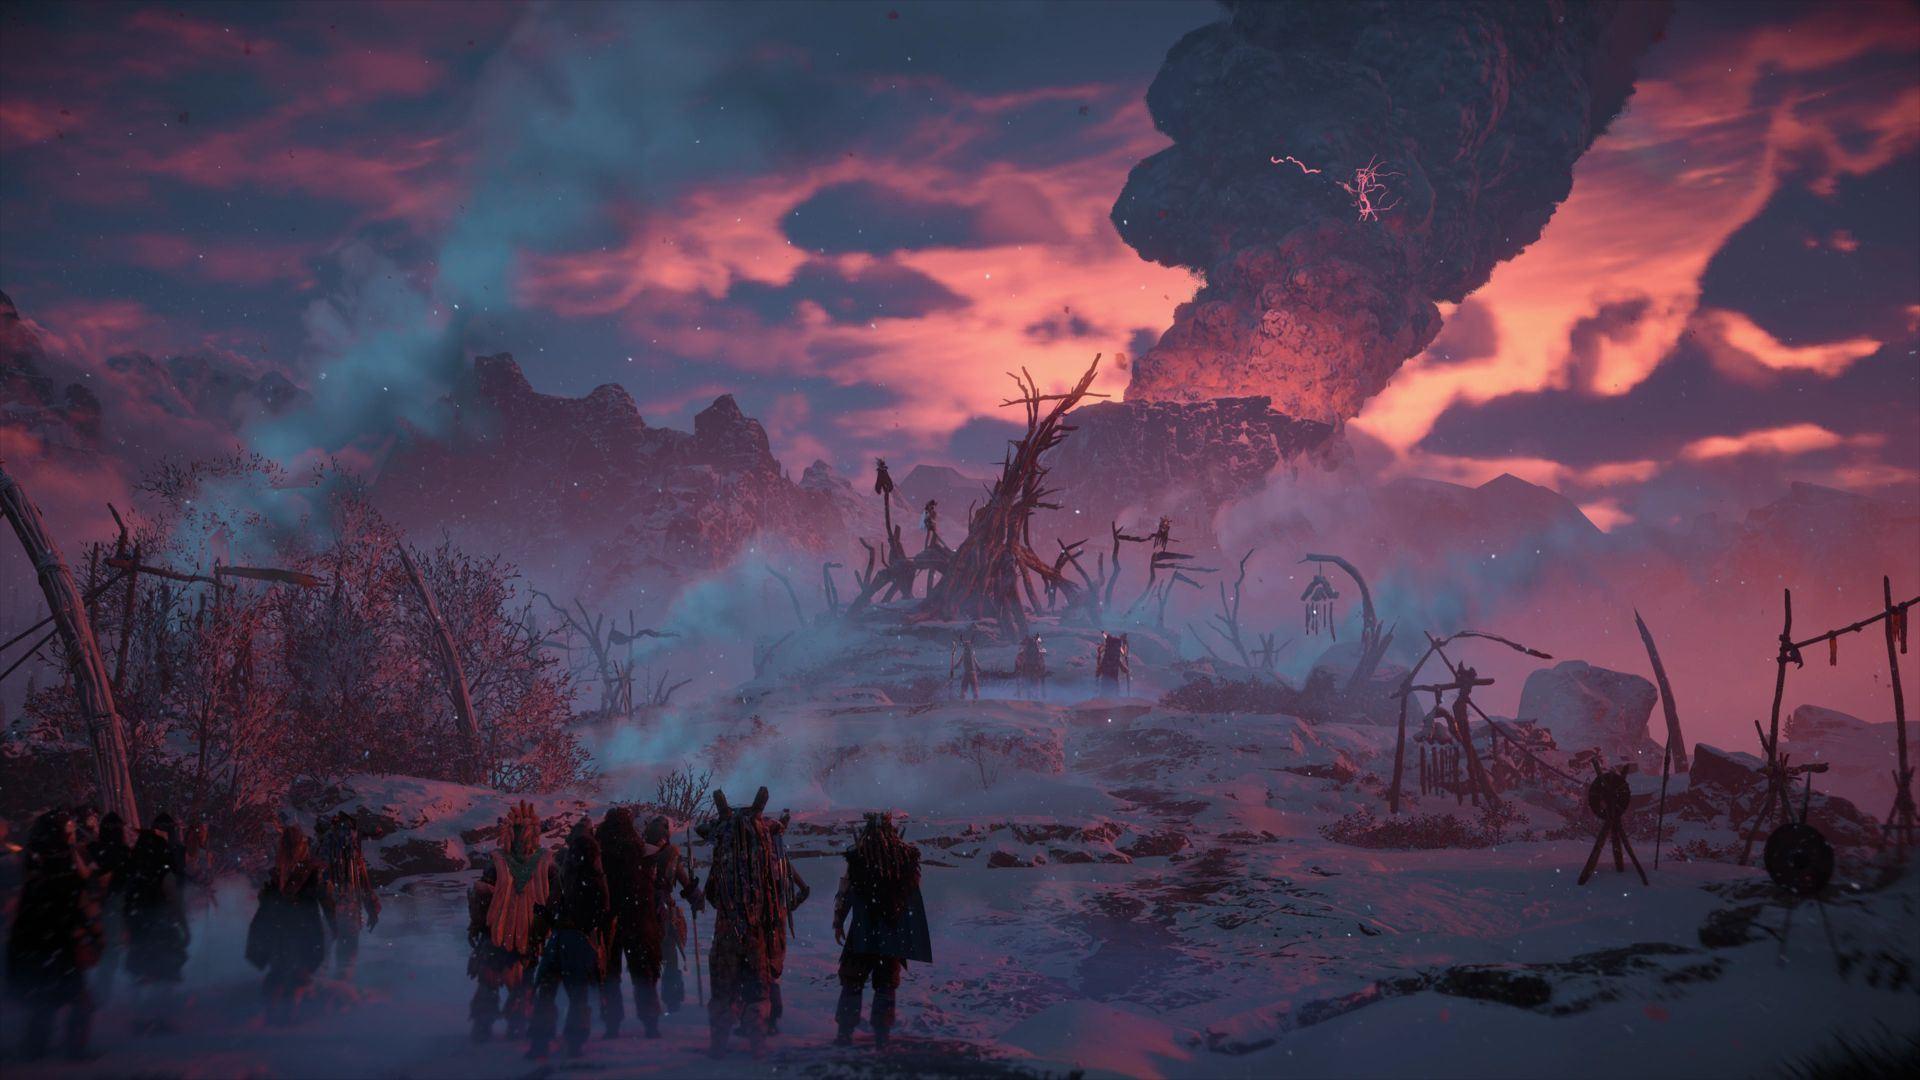 Horizon Zero Dawn: The Frozen Wilds - Horizon: Zero Dawn DLC